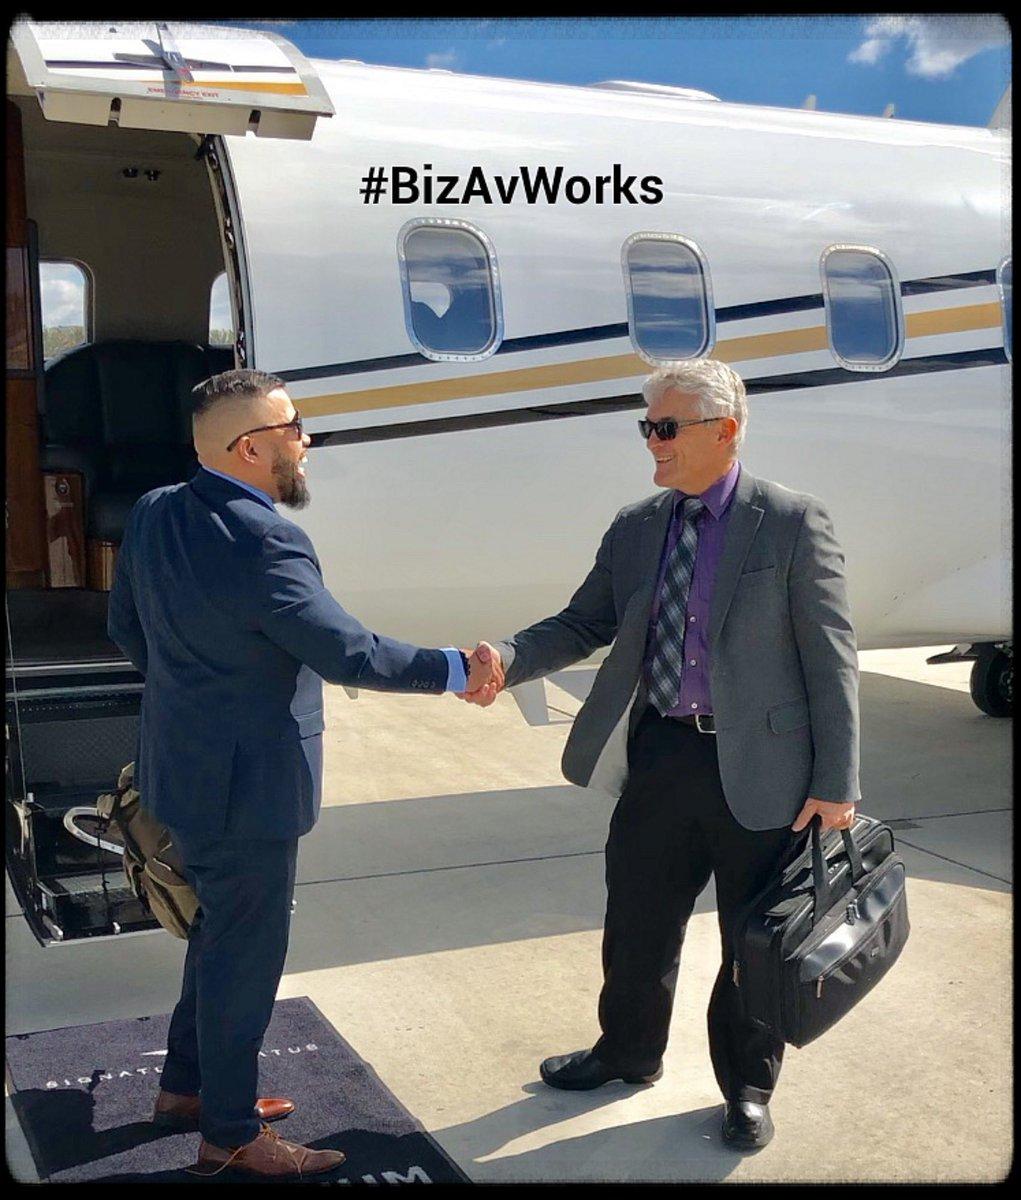 #bizavworksWednesday #bizav #bizavjets #bizavworks